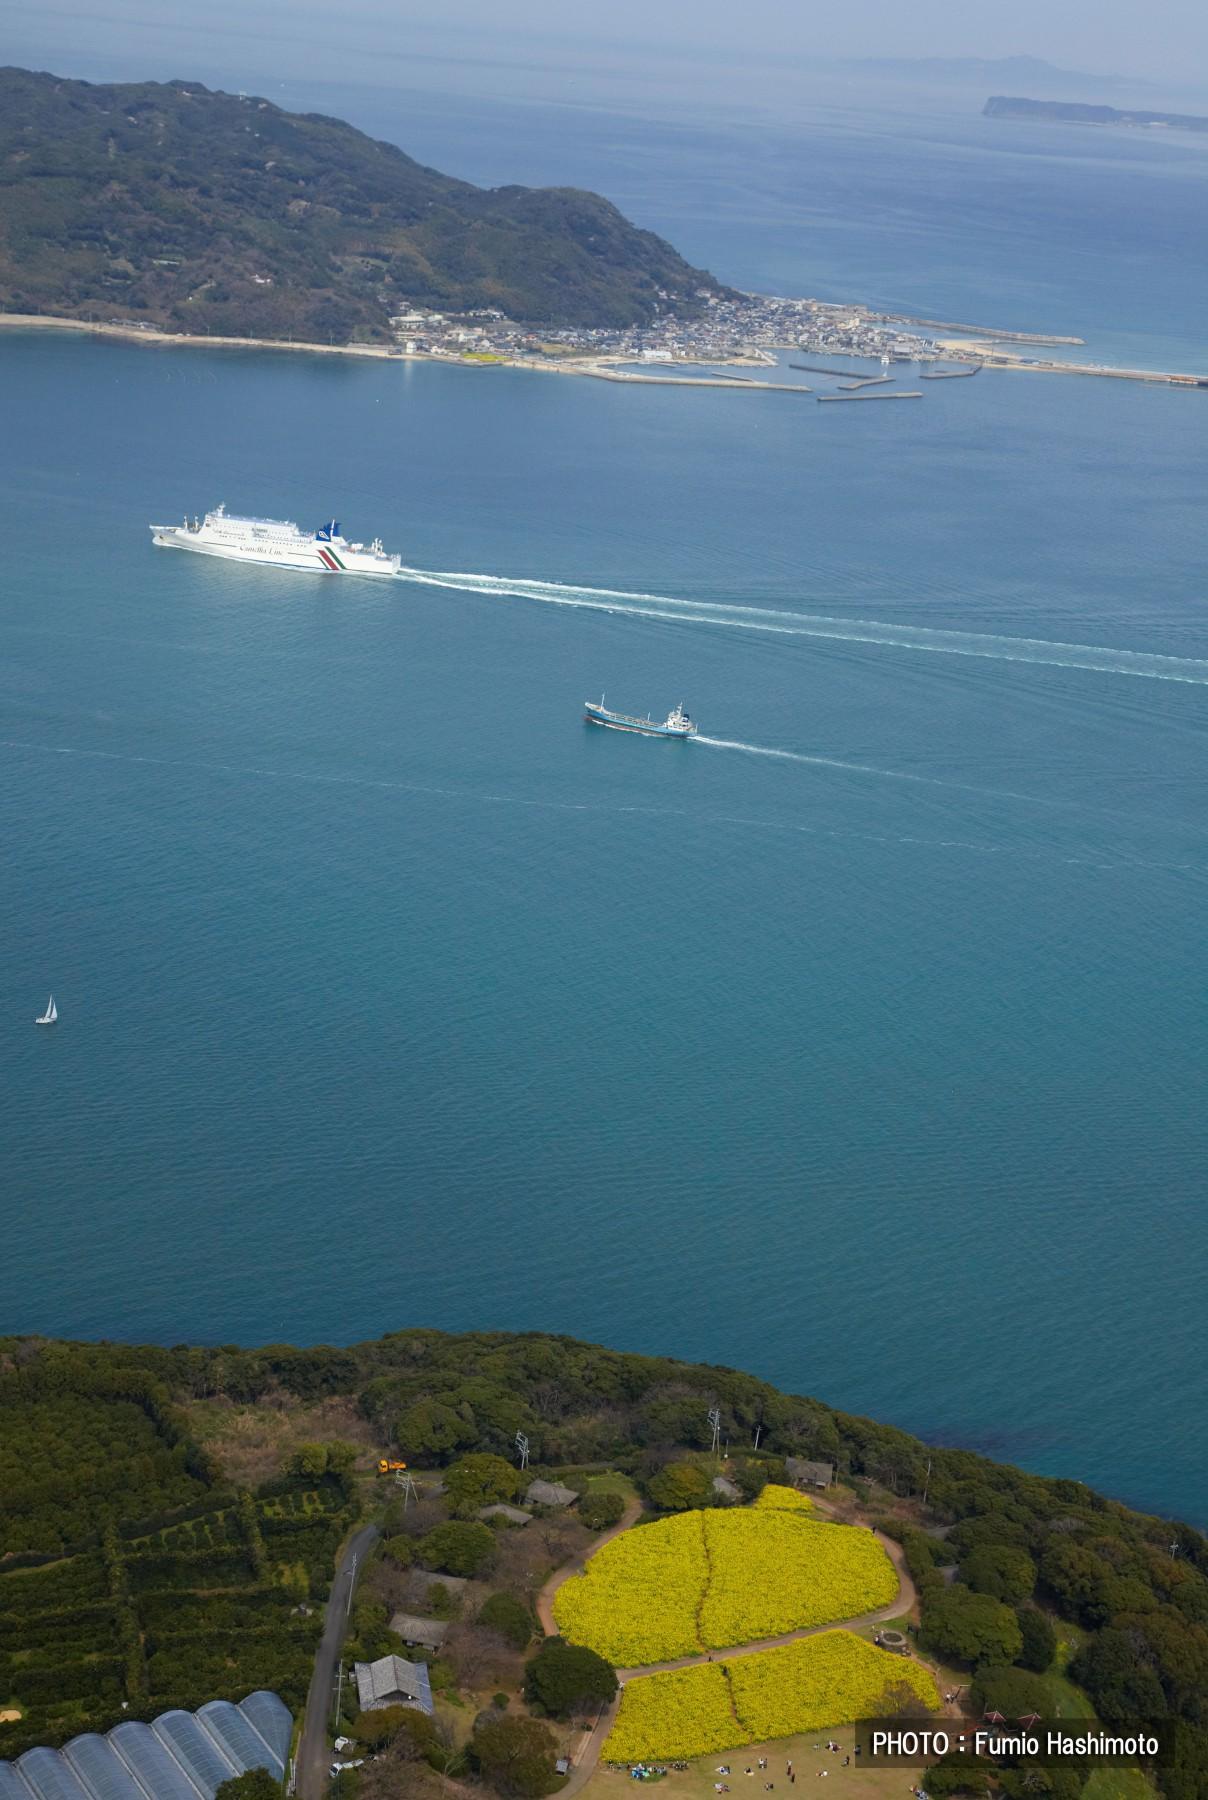 能古島・志賀島(2009)の画像